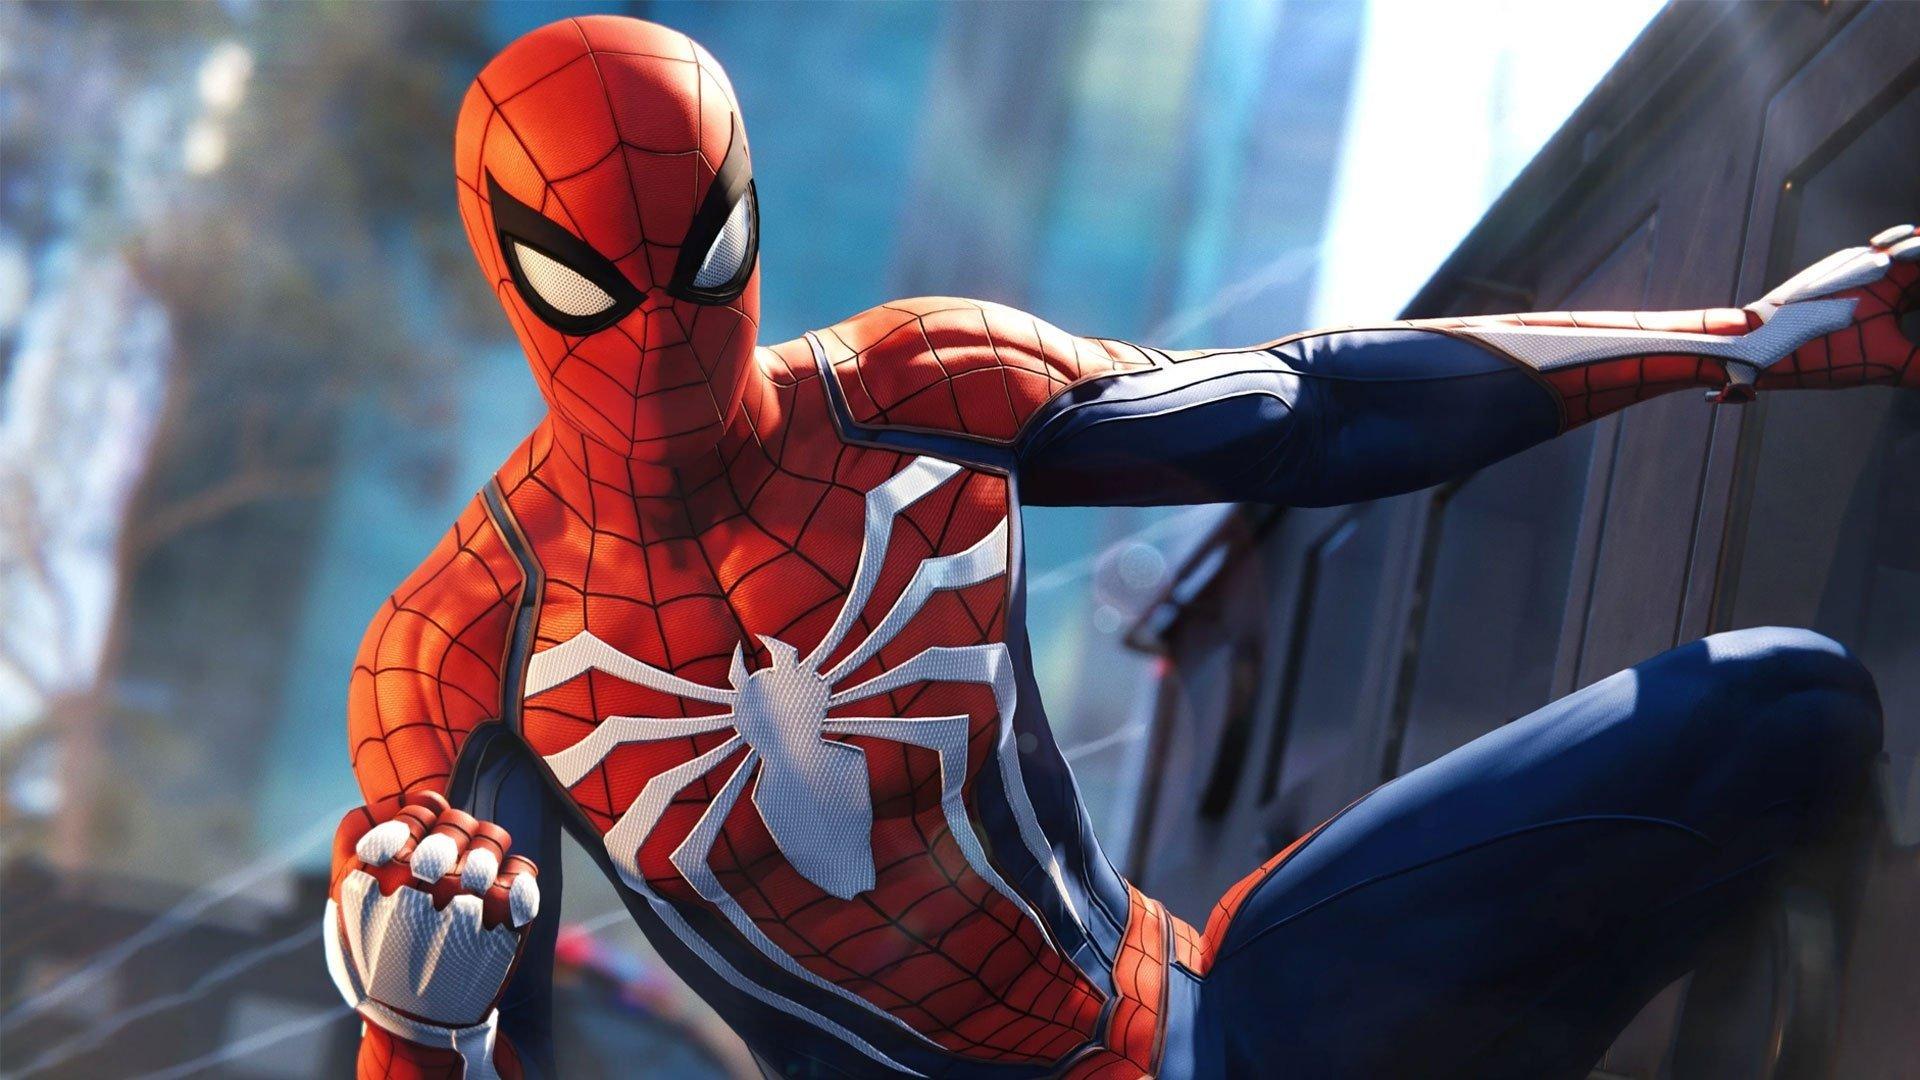 Spider Man remastered PS5